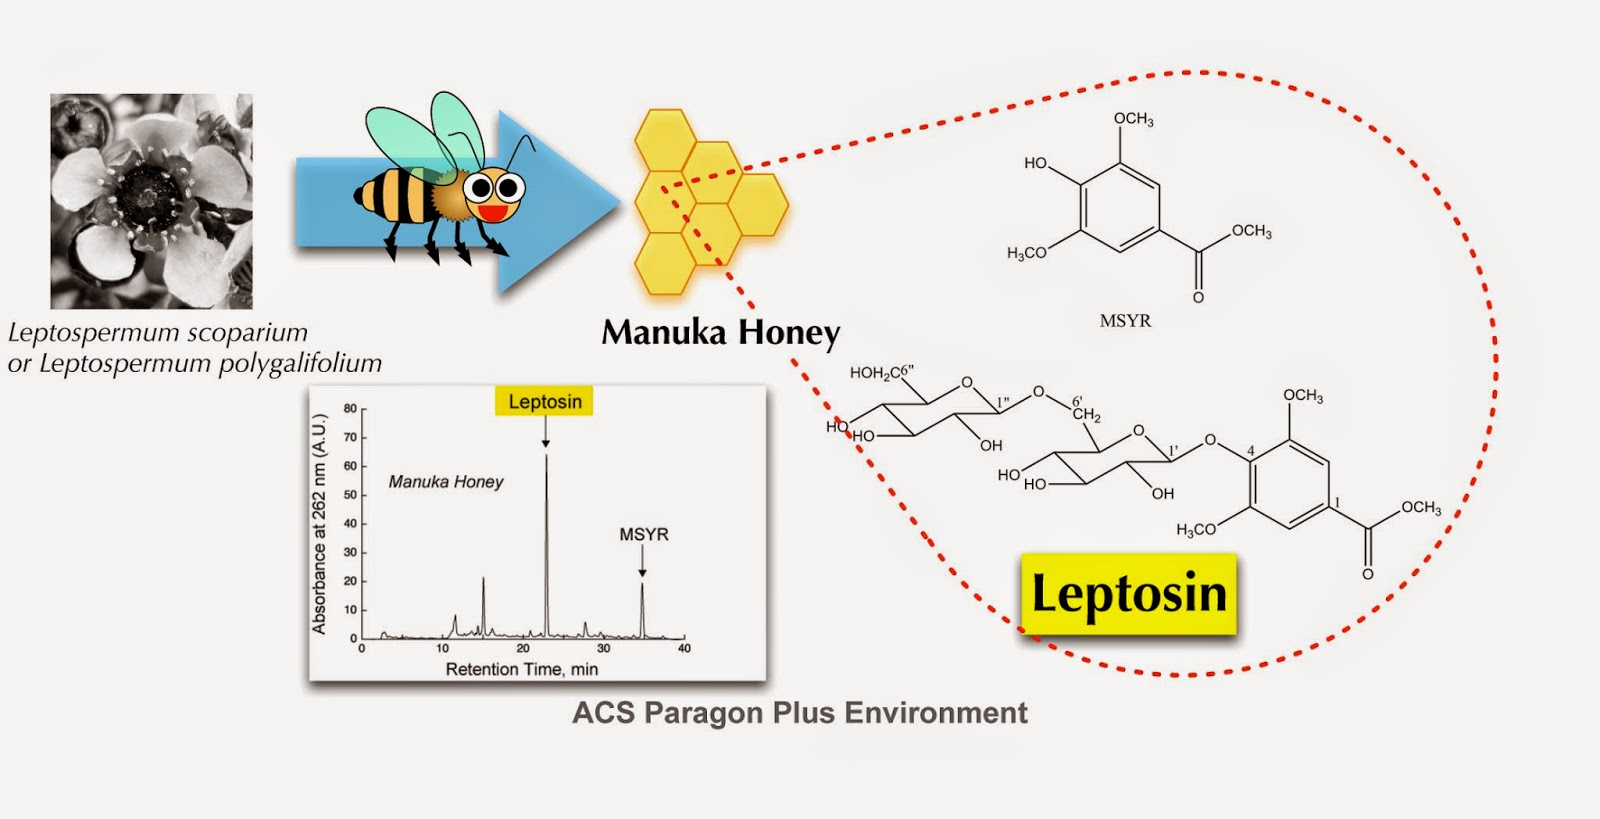 biosintesis glikosida steroid